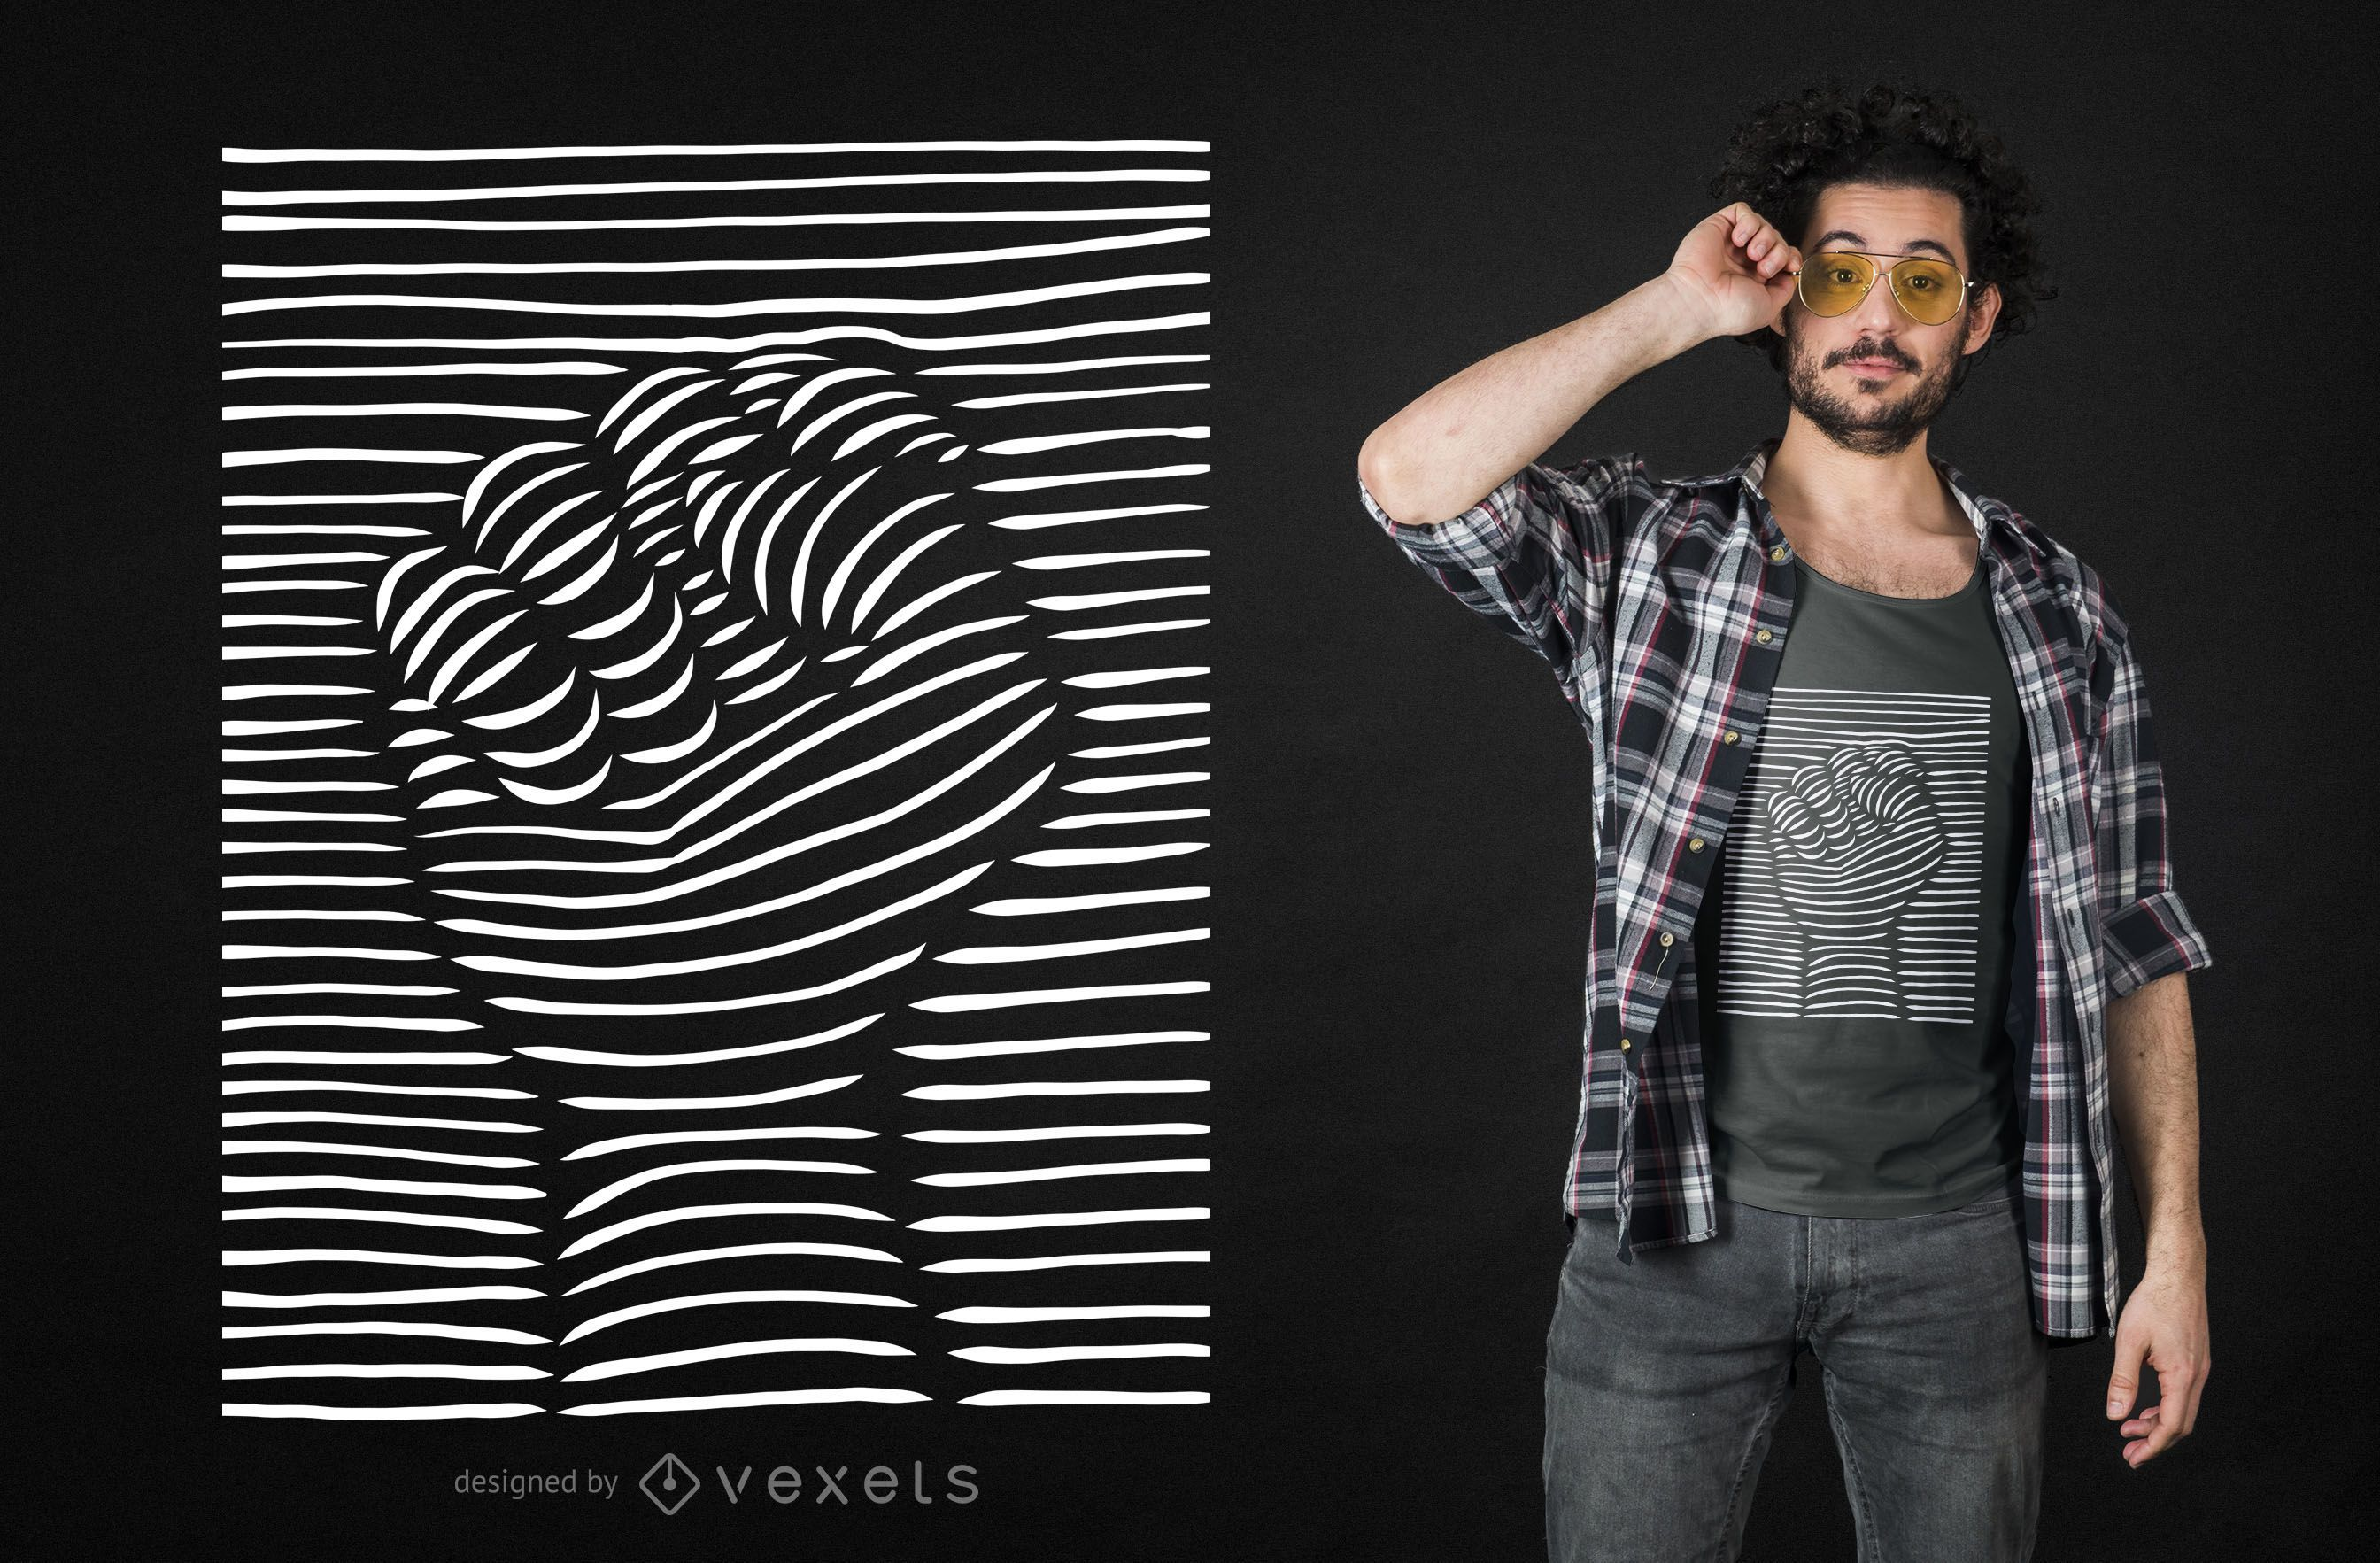 3D Effect Raised Fist T-shirt Design